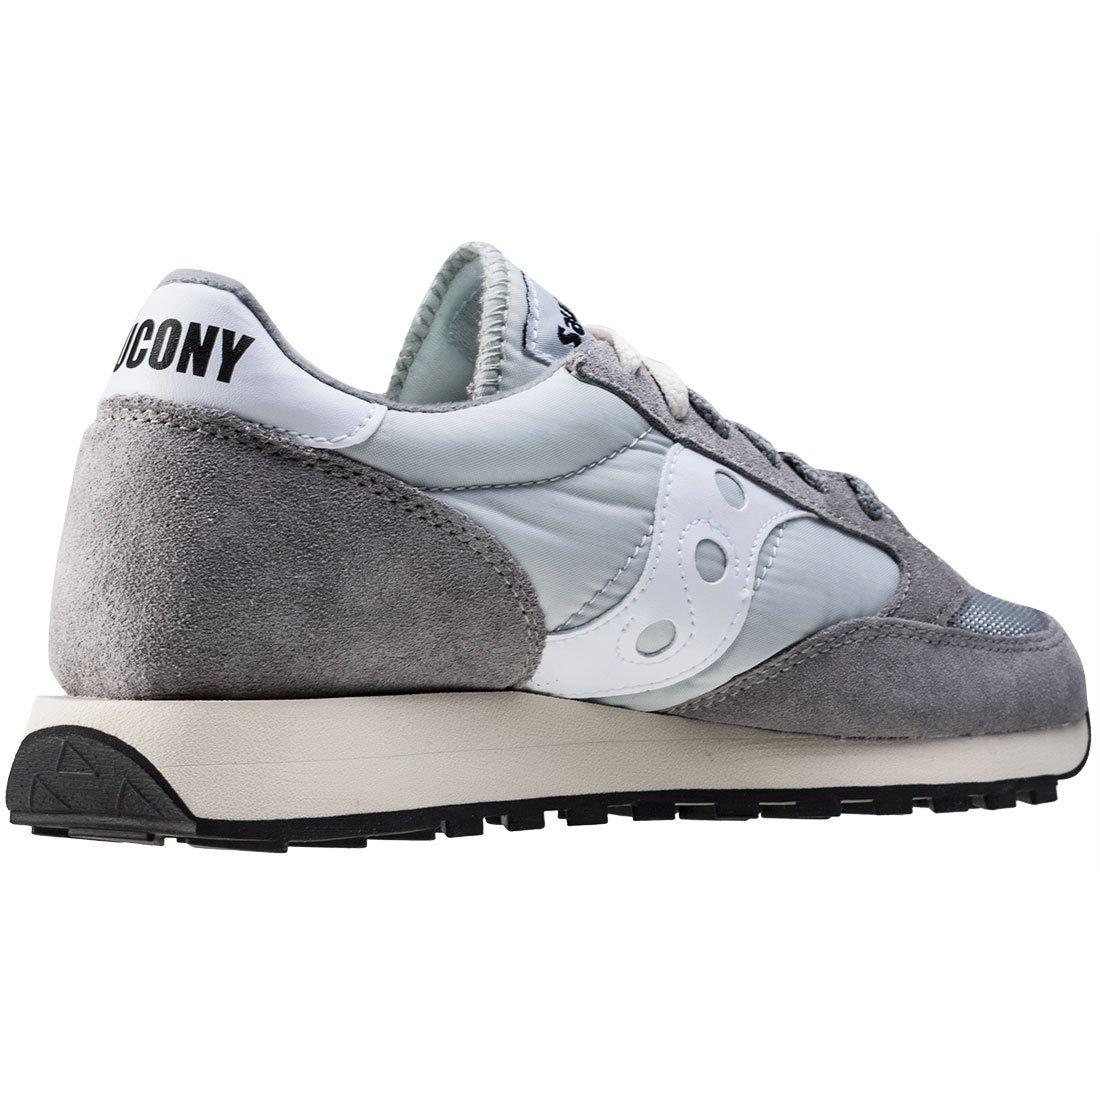 Saucony Jazz Original Vintage, scarpe da ginnastica ginnastica ginnastica Unisex – Adulto | Caratteristiche Eccezionali  ee61c7